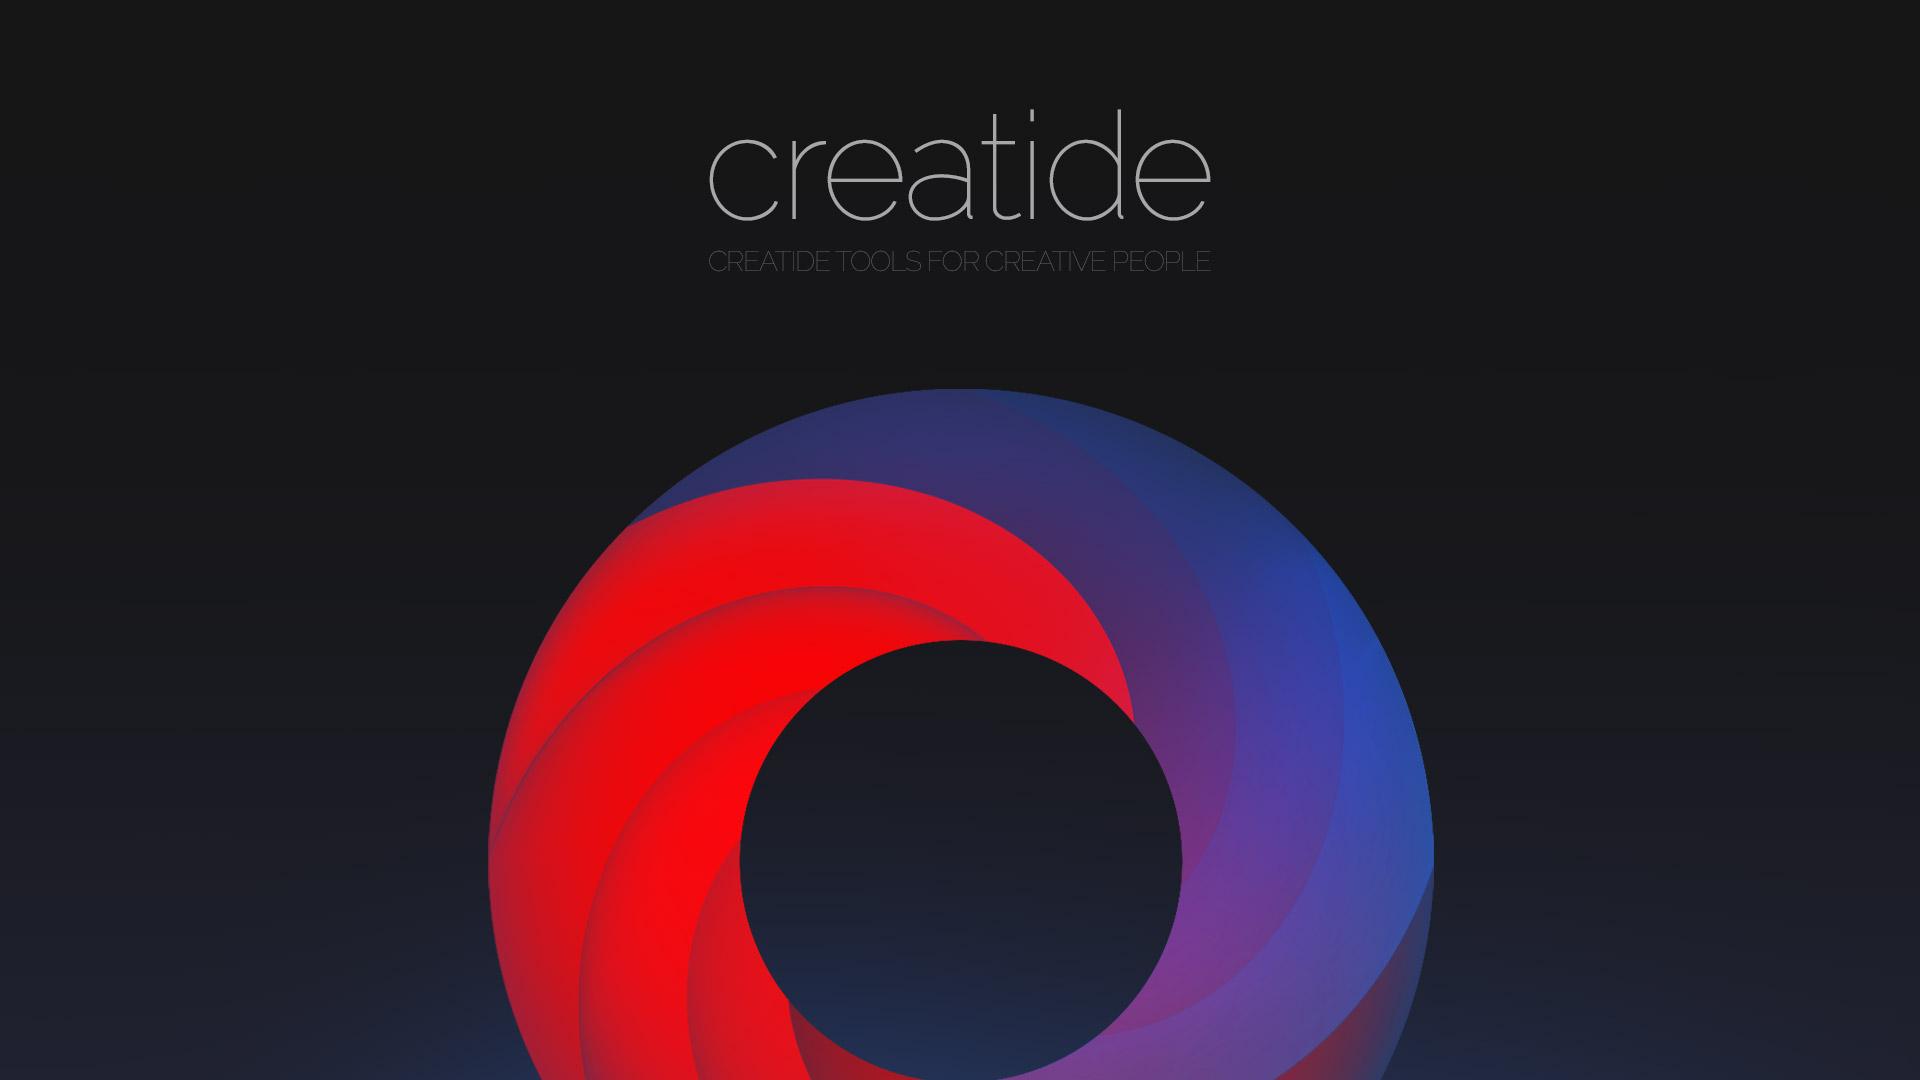 Creatide